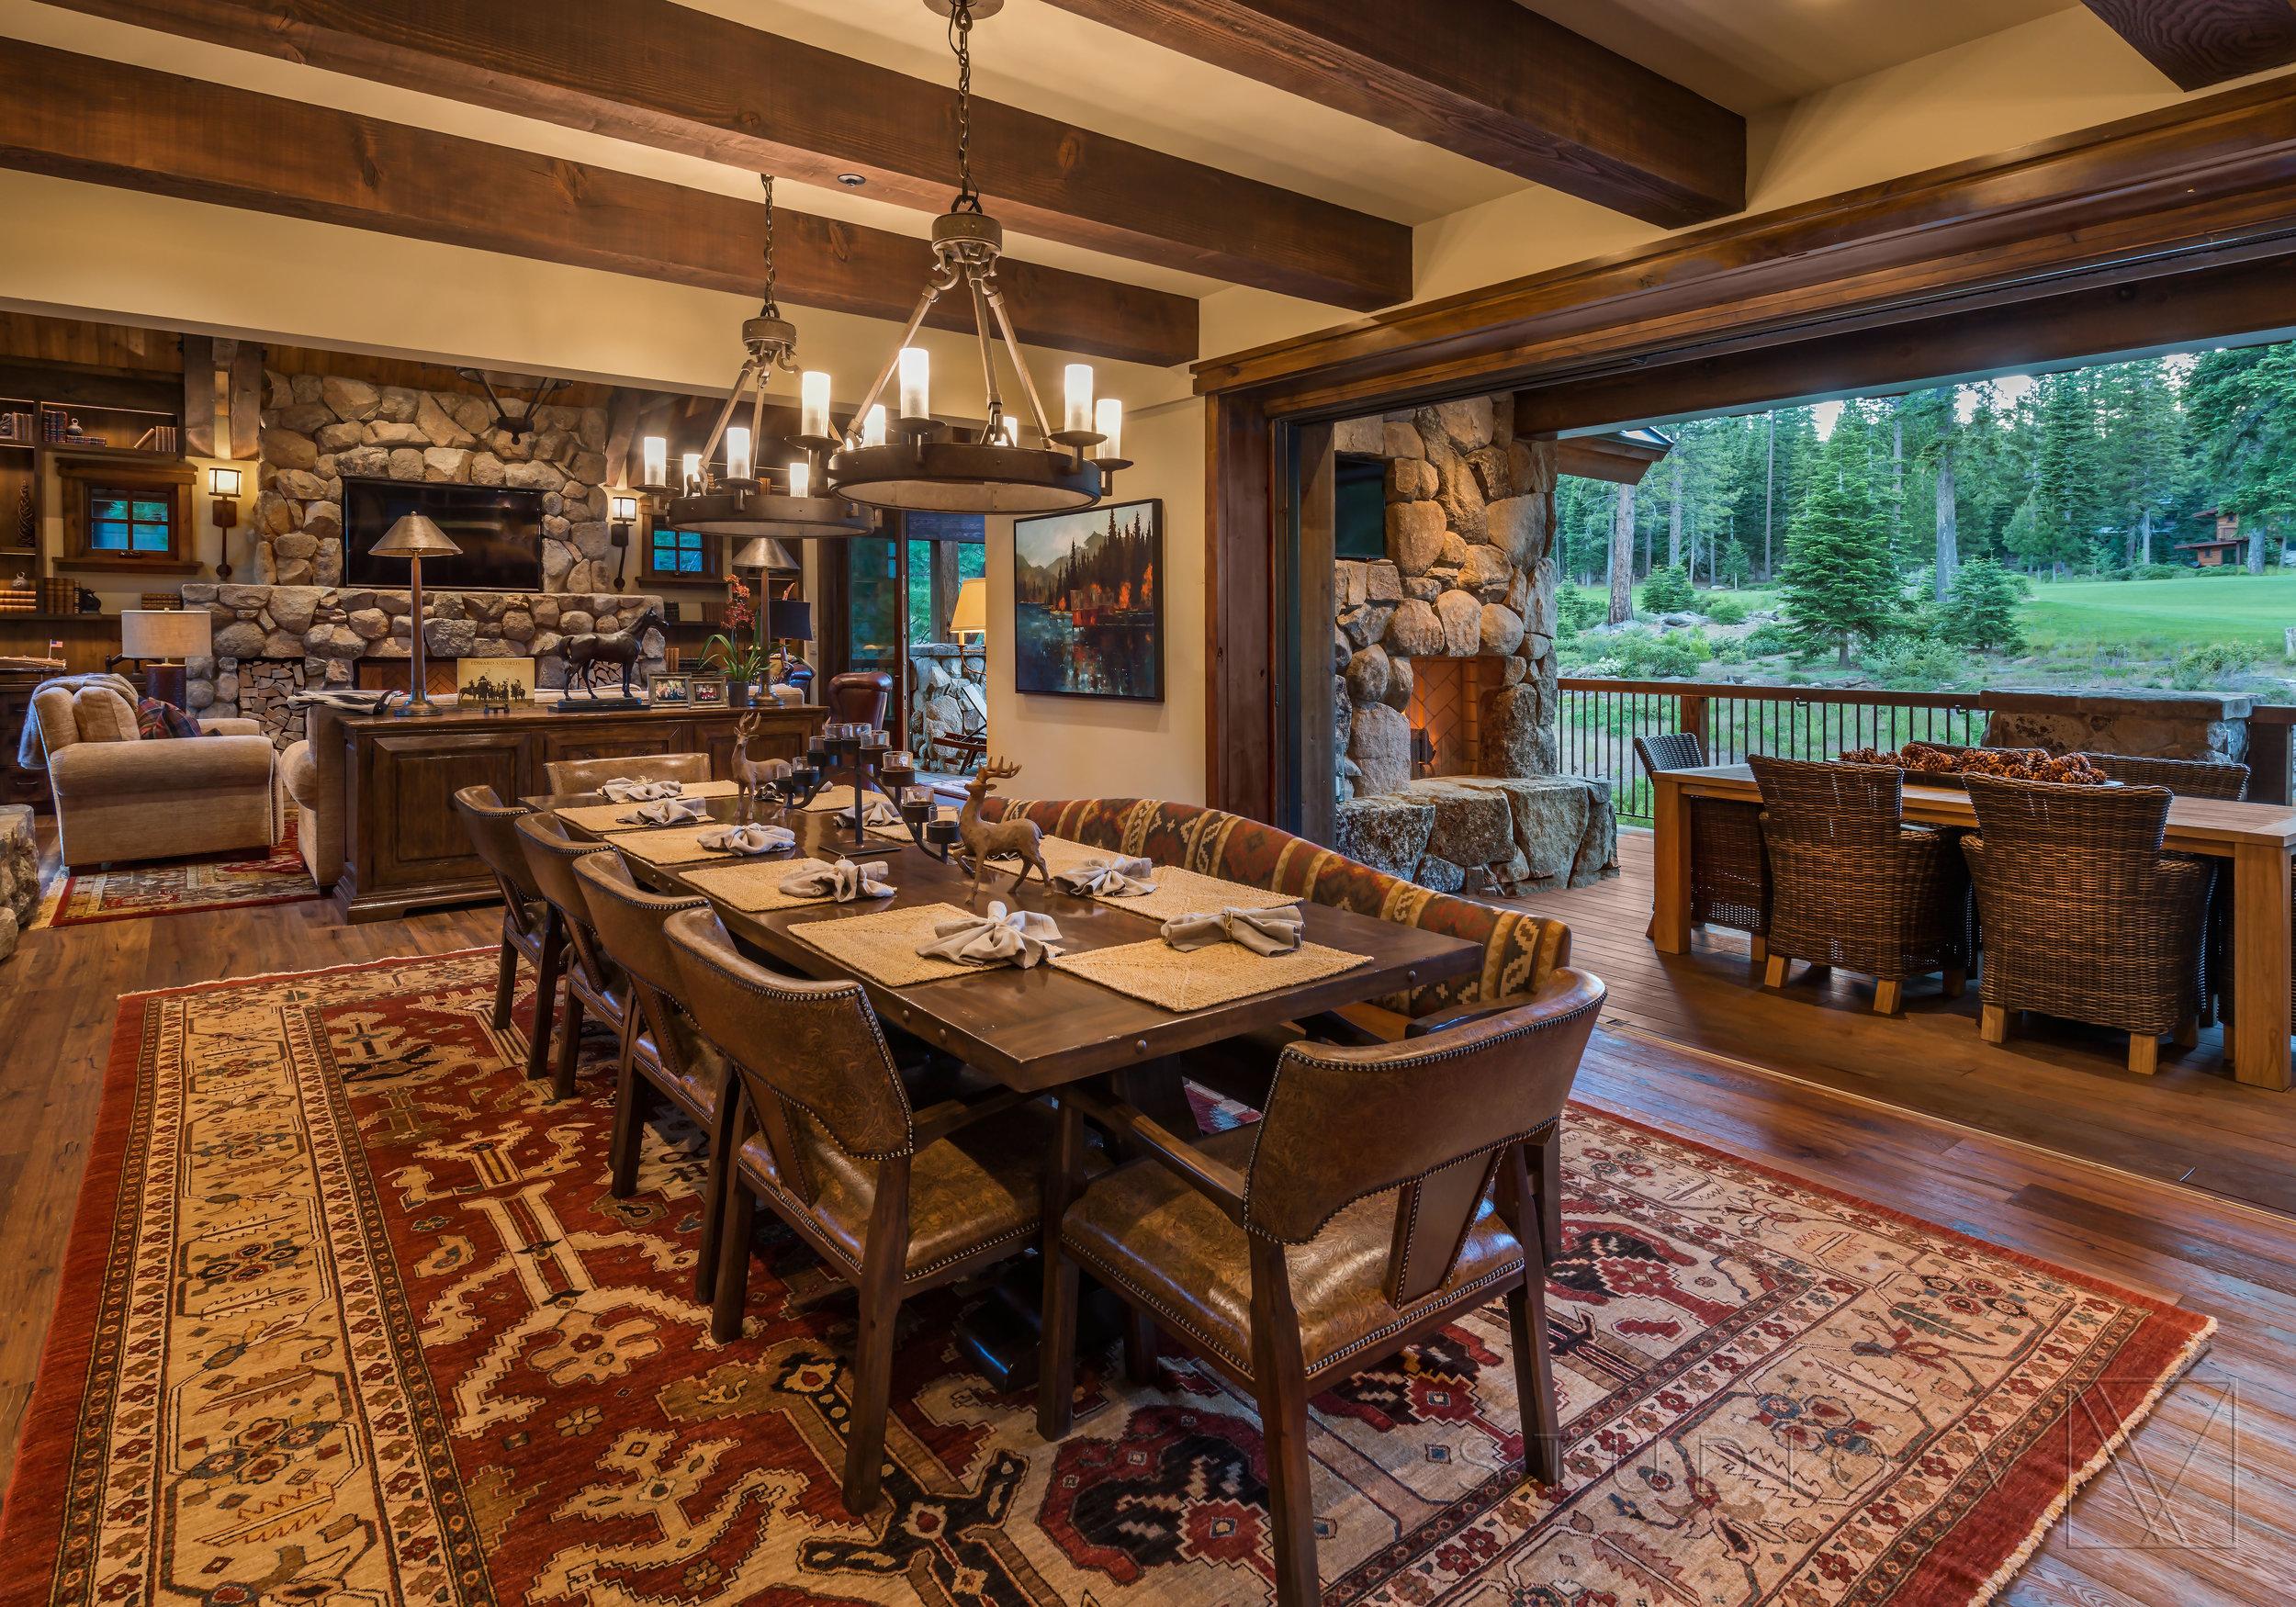 Lodge Cabin Tahoe Truckee Martis Camp CA California Traditional Studio V Interior Architecture Design Scottsdale Arizona AZ (27).jpg